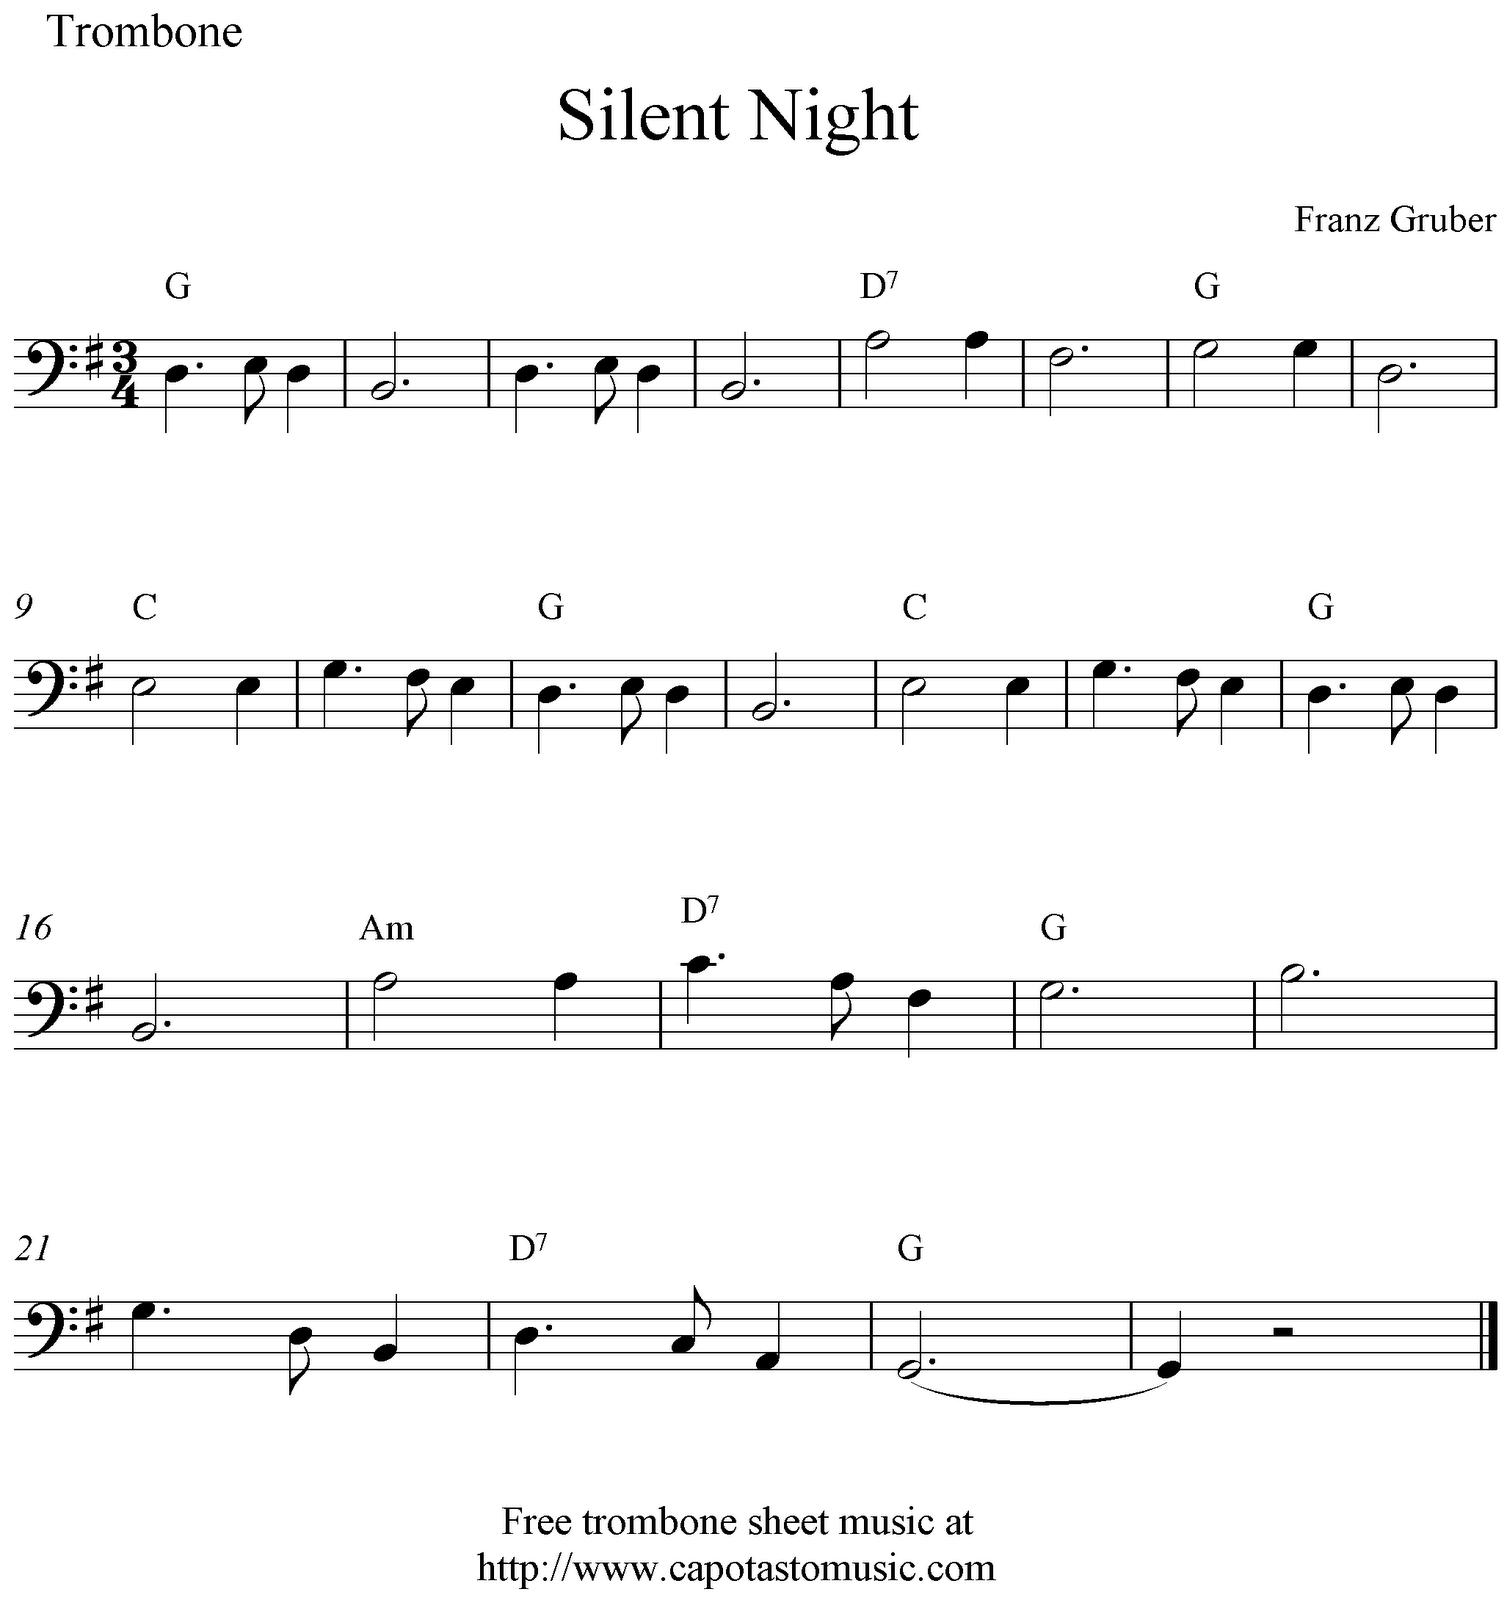 Silent Night, Free Christmas Trombone Sheet Music Notes - Trombone Christmas Sheet Music Free Printable